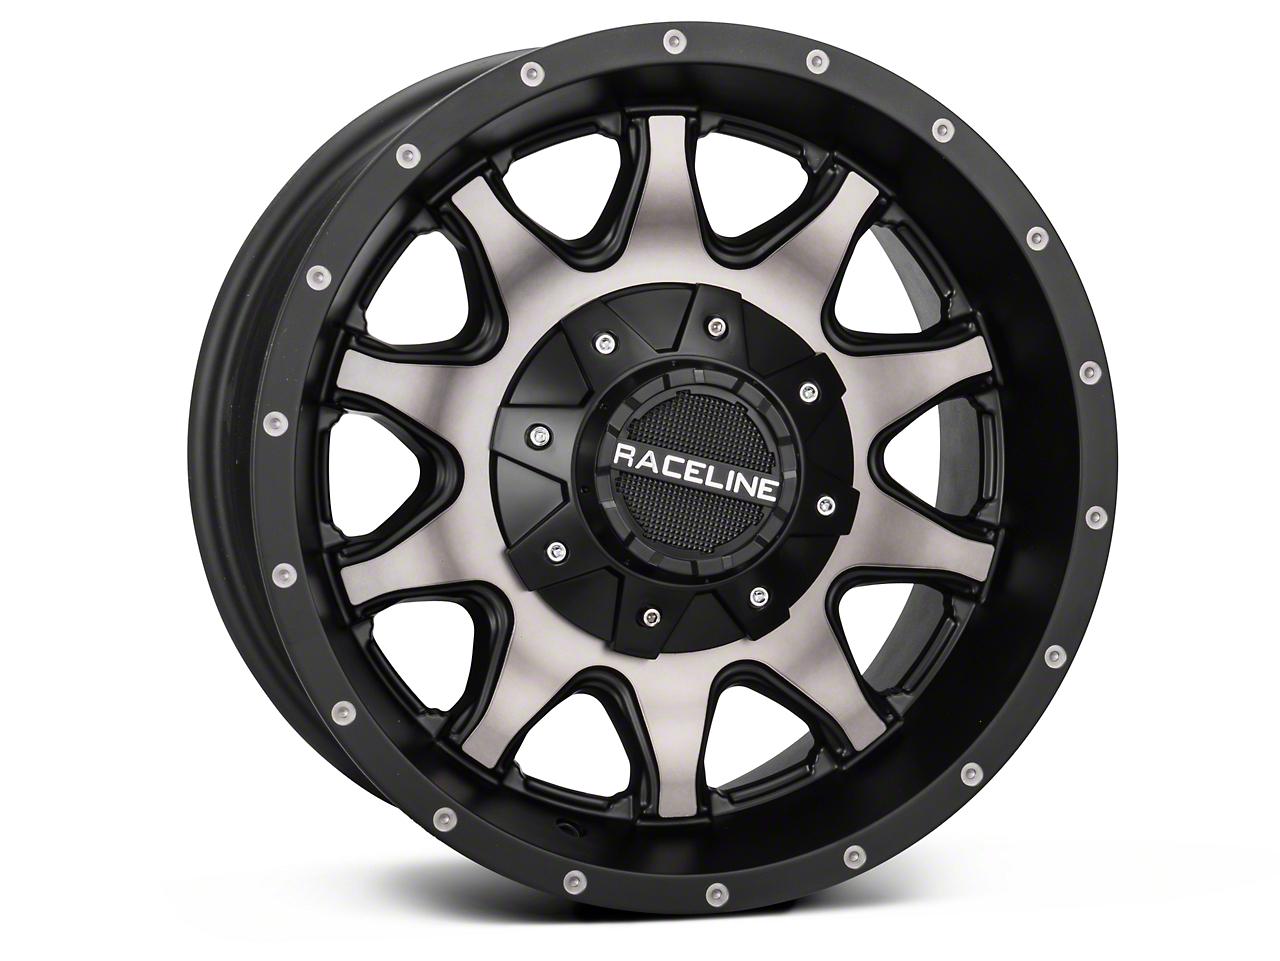 Raceline 930DM Shift Black Machined w/ Dark Tint Wheel - 16x8 (07-18 Wrangler JK; 2018 Wrangler JL)